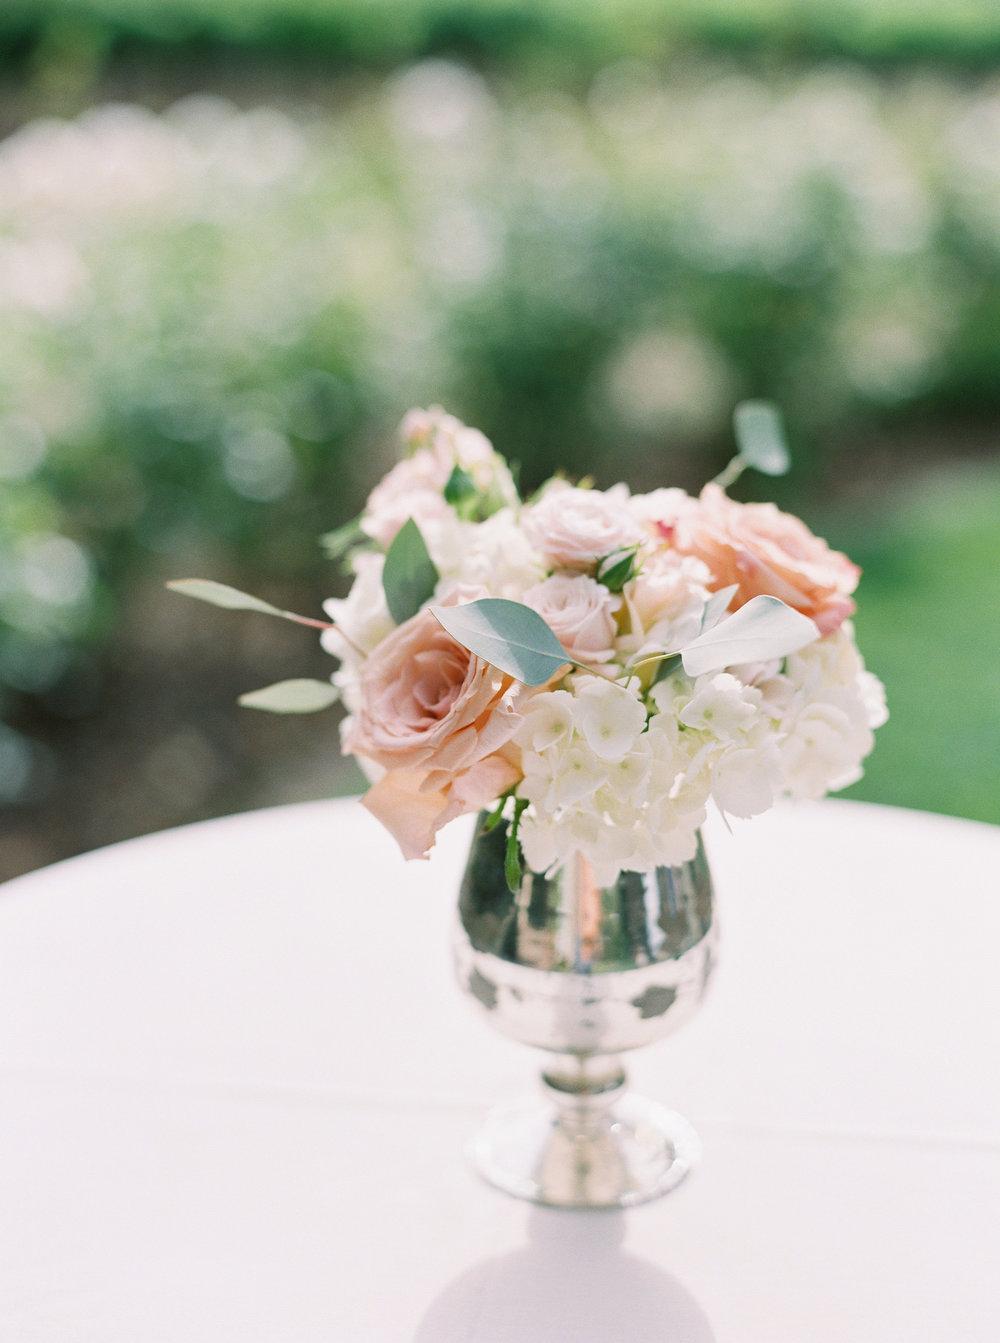 Harvest-inn-wedding-in-napa-california-188.jpg